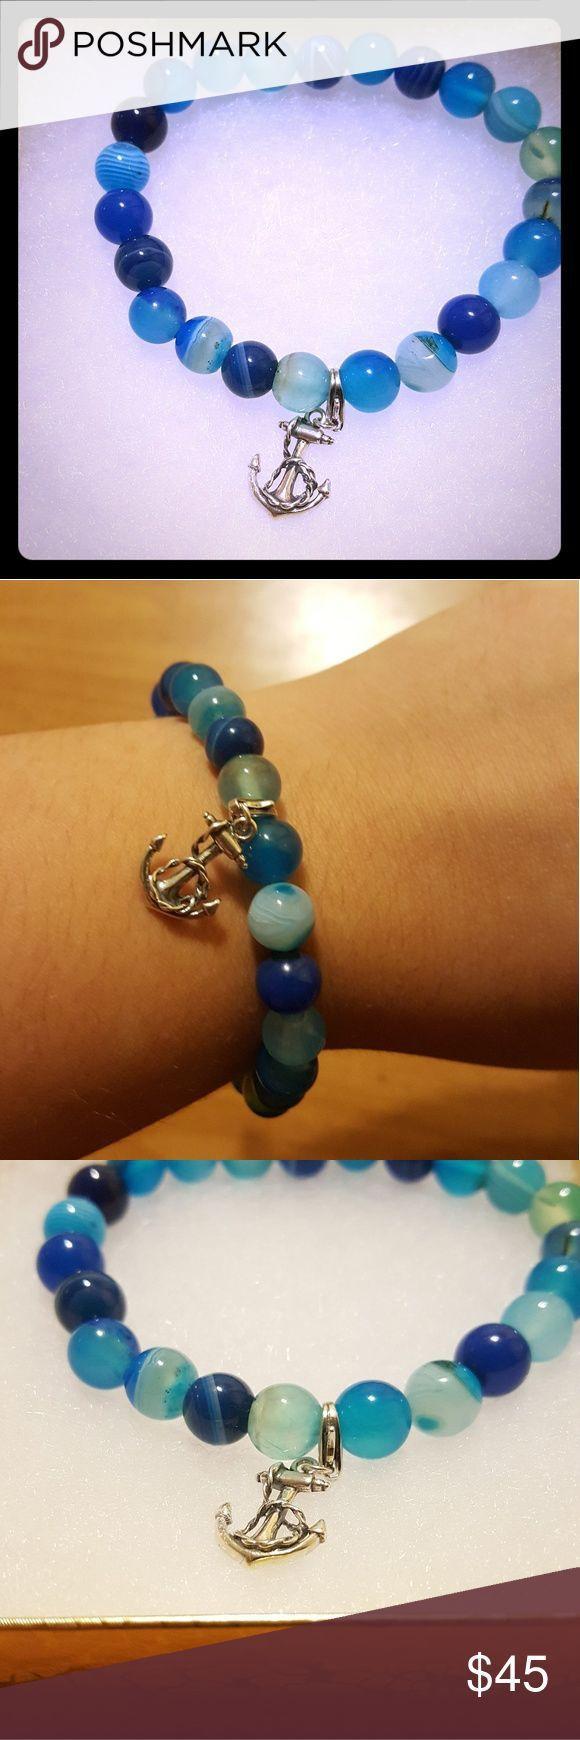 Tendance salopette 2017   Marine Blue Agate Bracelet with Anchor Beautiful marine blue ag